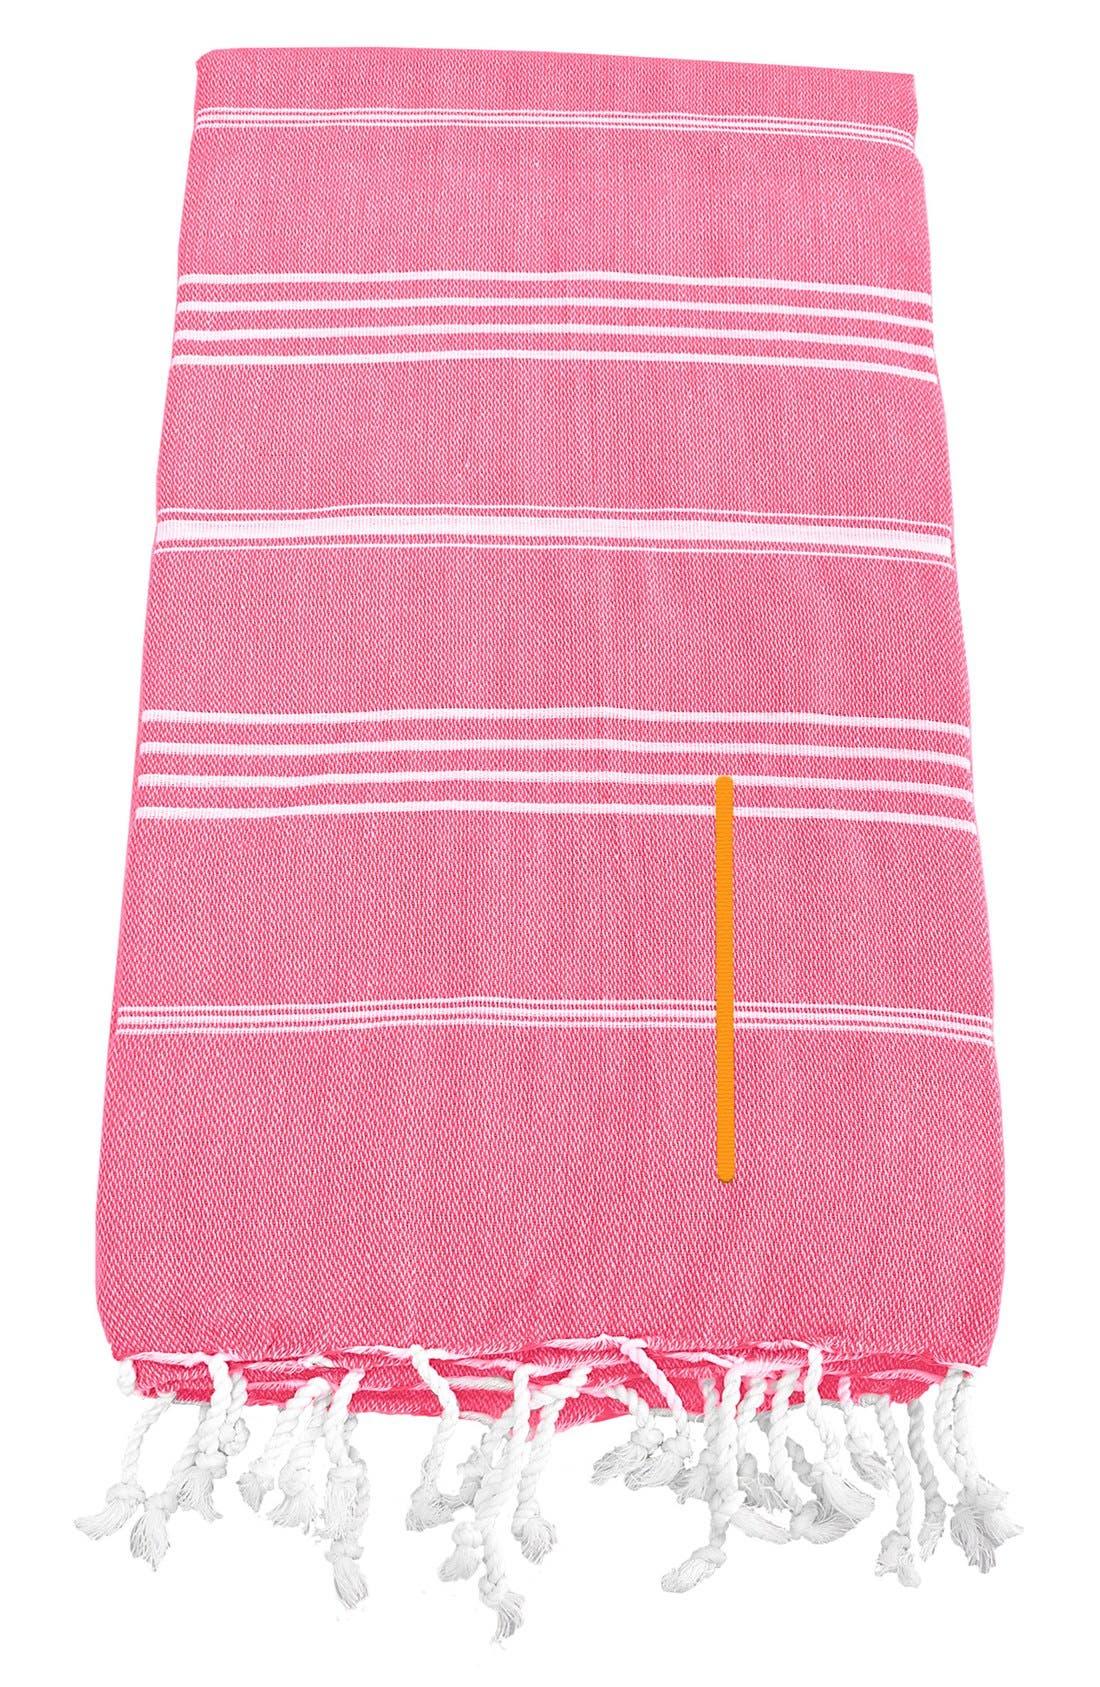 Monogram Turkish Cotton Towel,                             Main thumbnail 145, color,